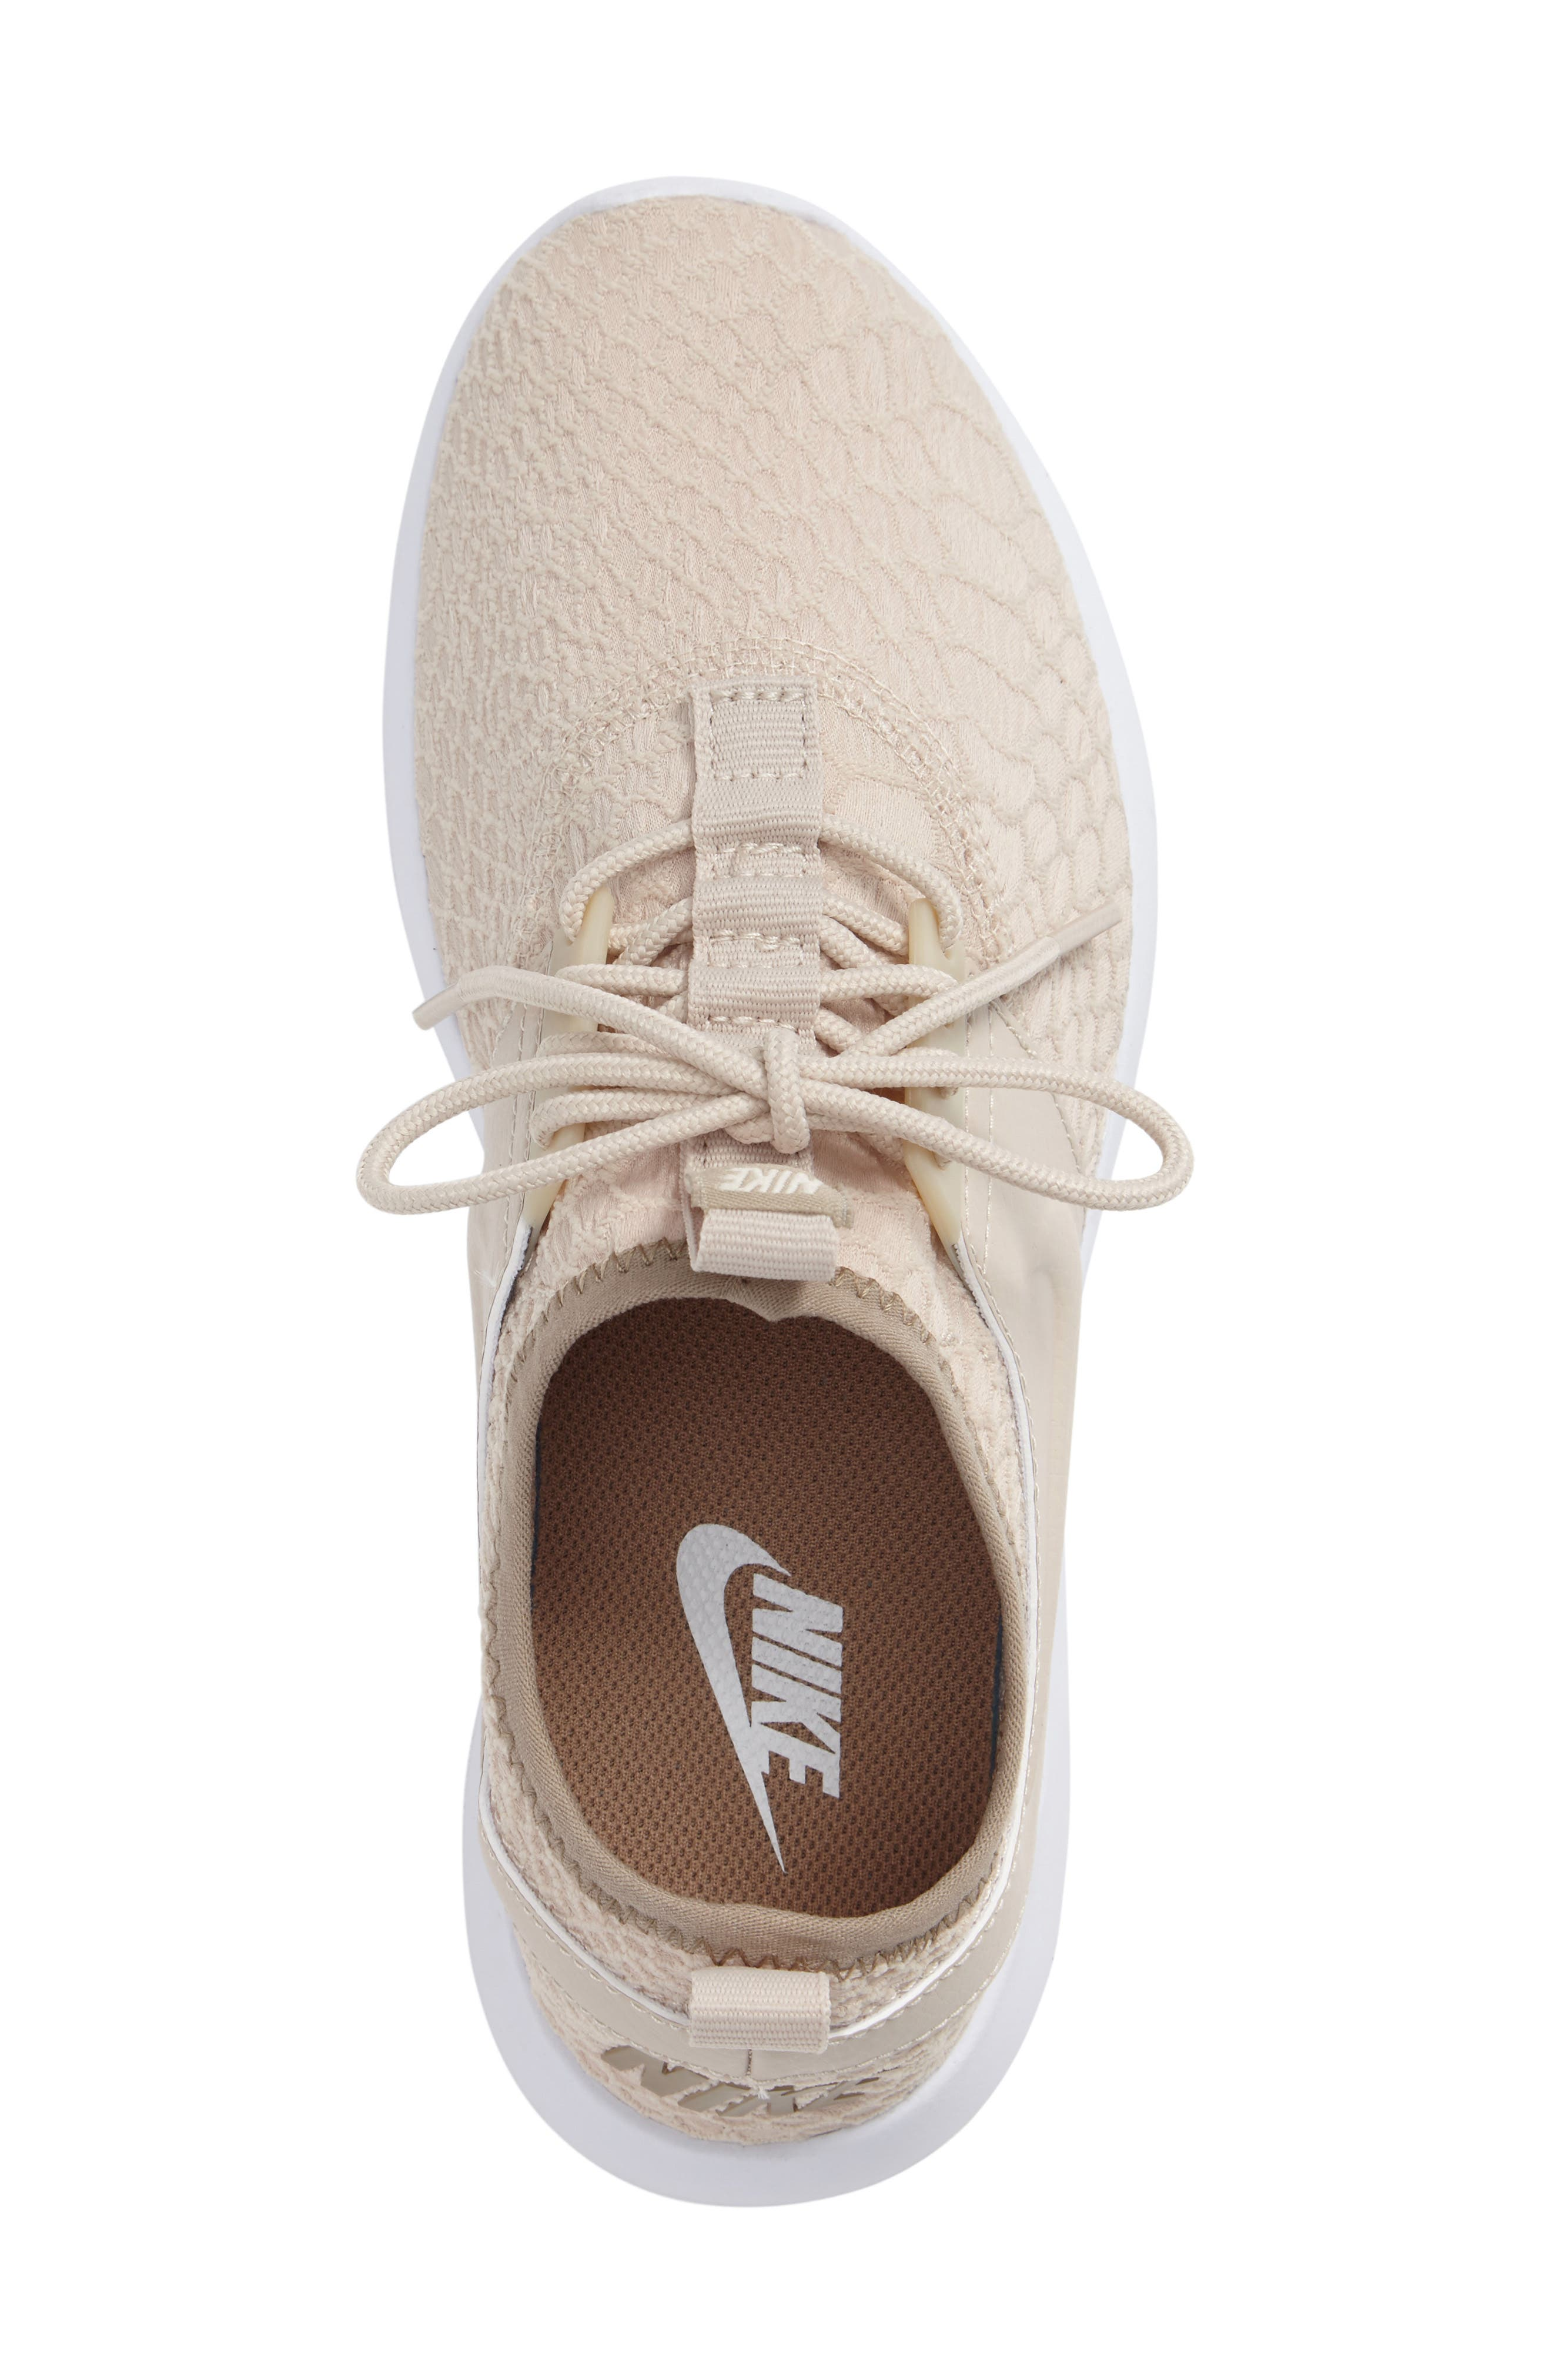 Juvenate SE Sneaker,                             Alternate thumbnail 28, color,